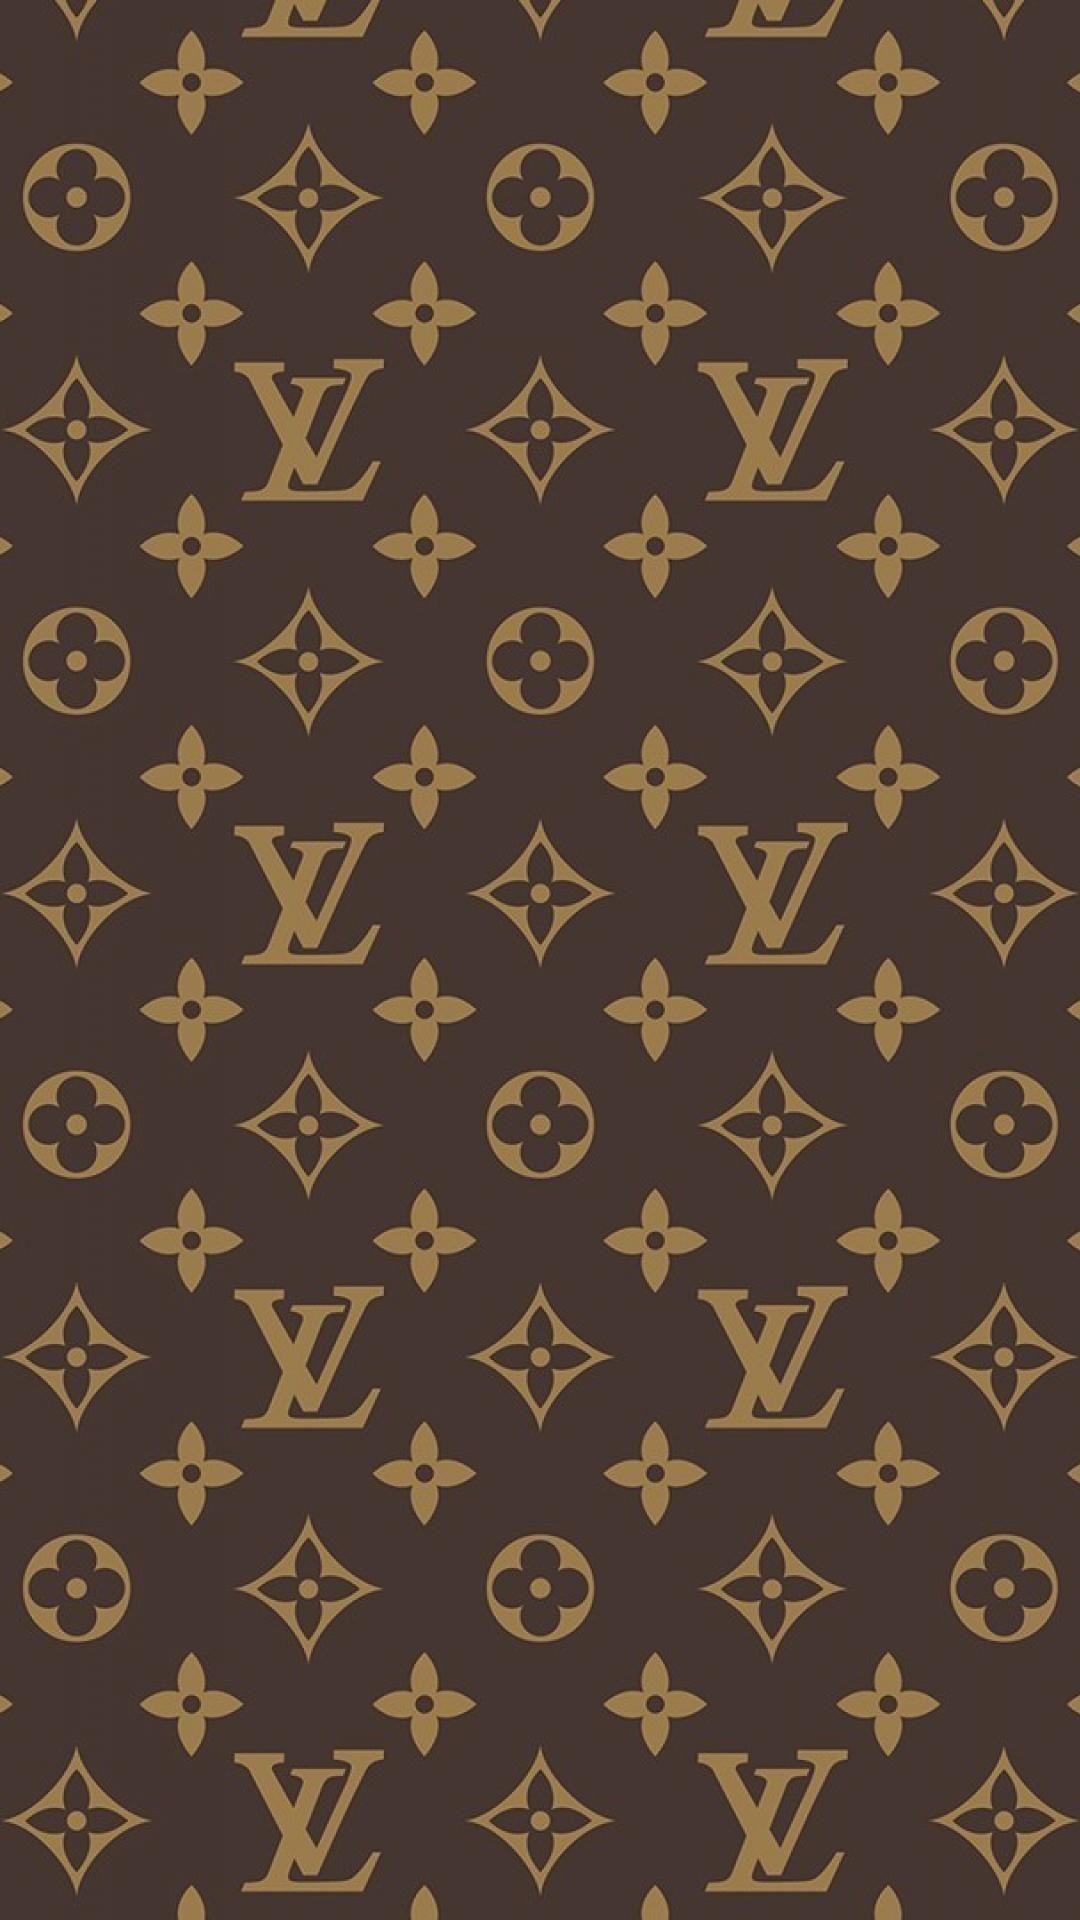 Louis Vuitton iPhone Wallpapers - Top Free Louis Vuitton iPhone Backgrounds - WallpaperAccess